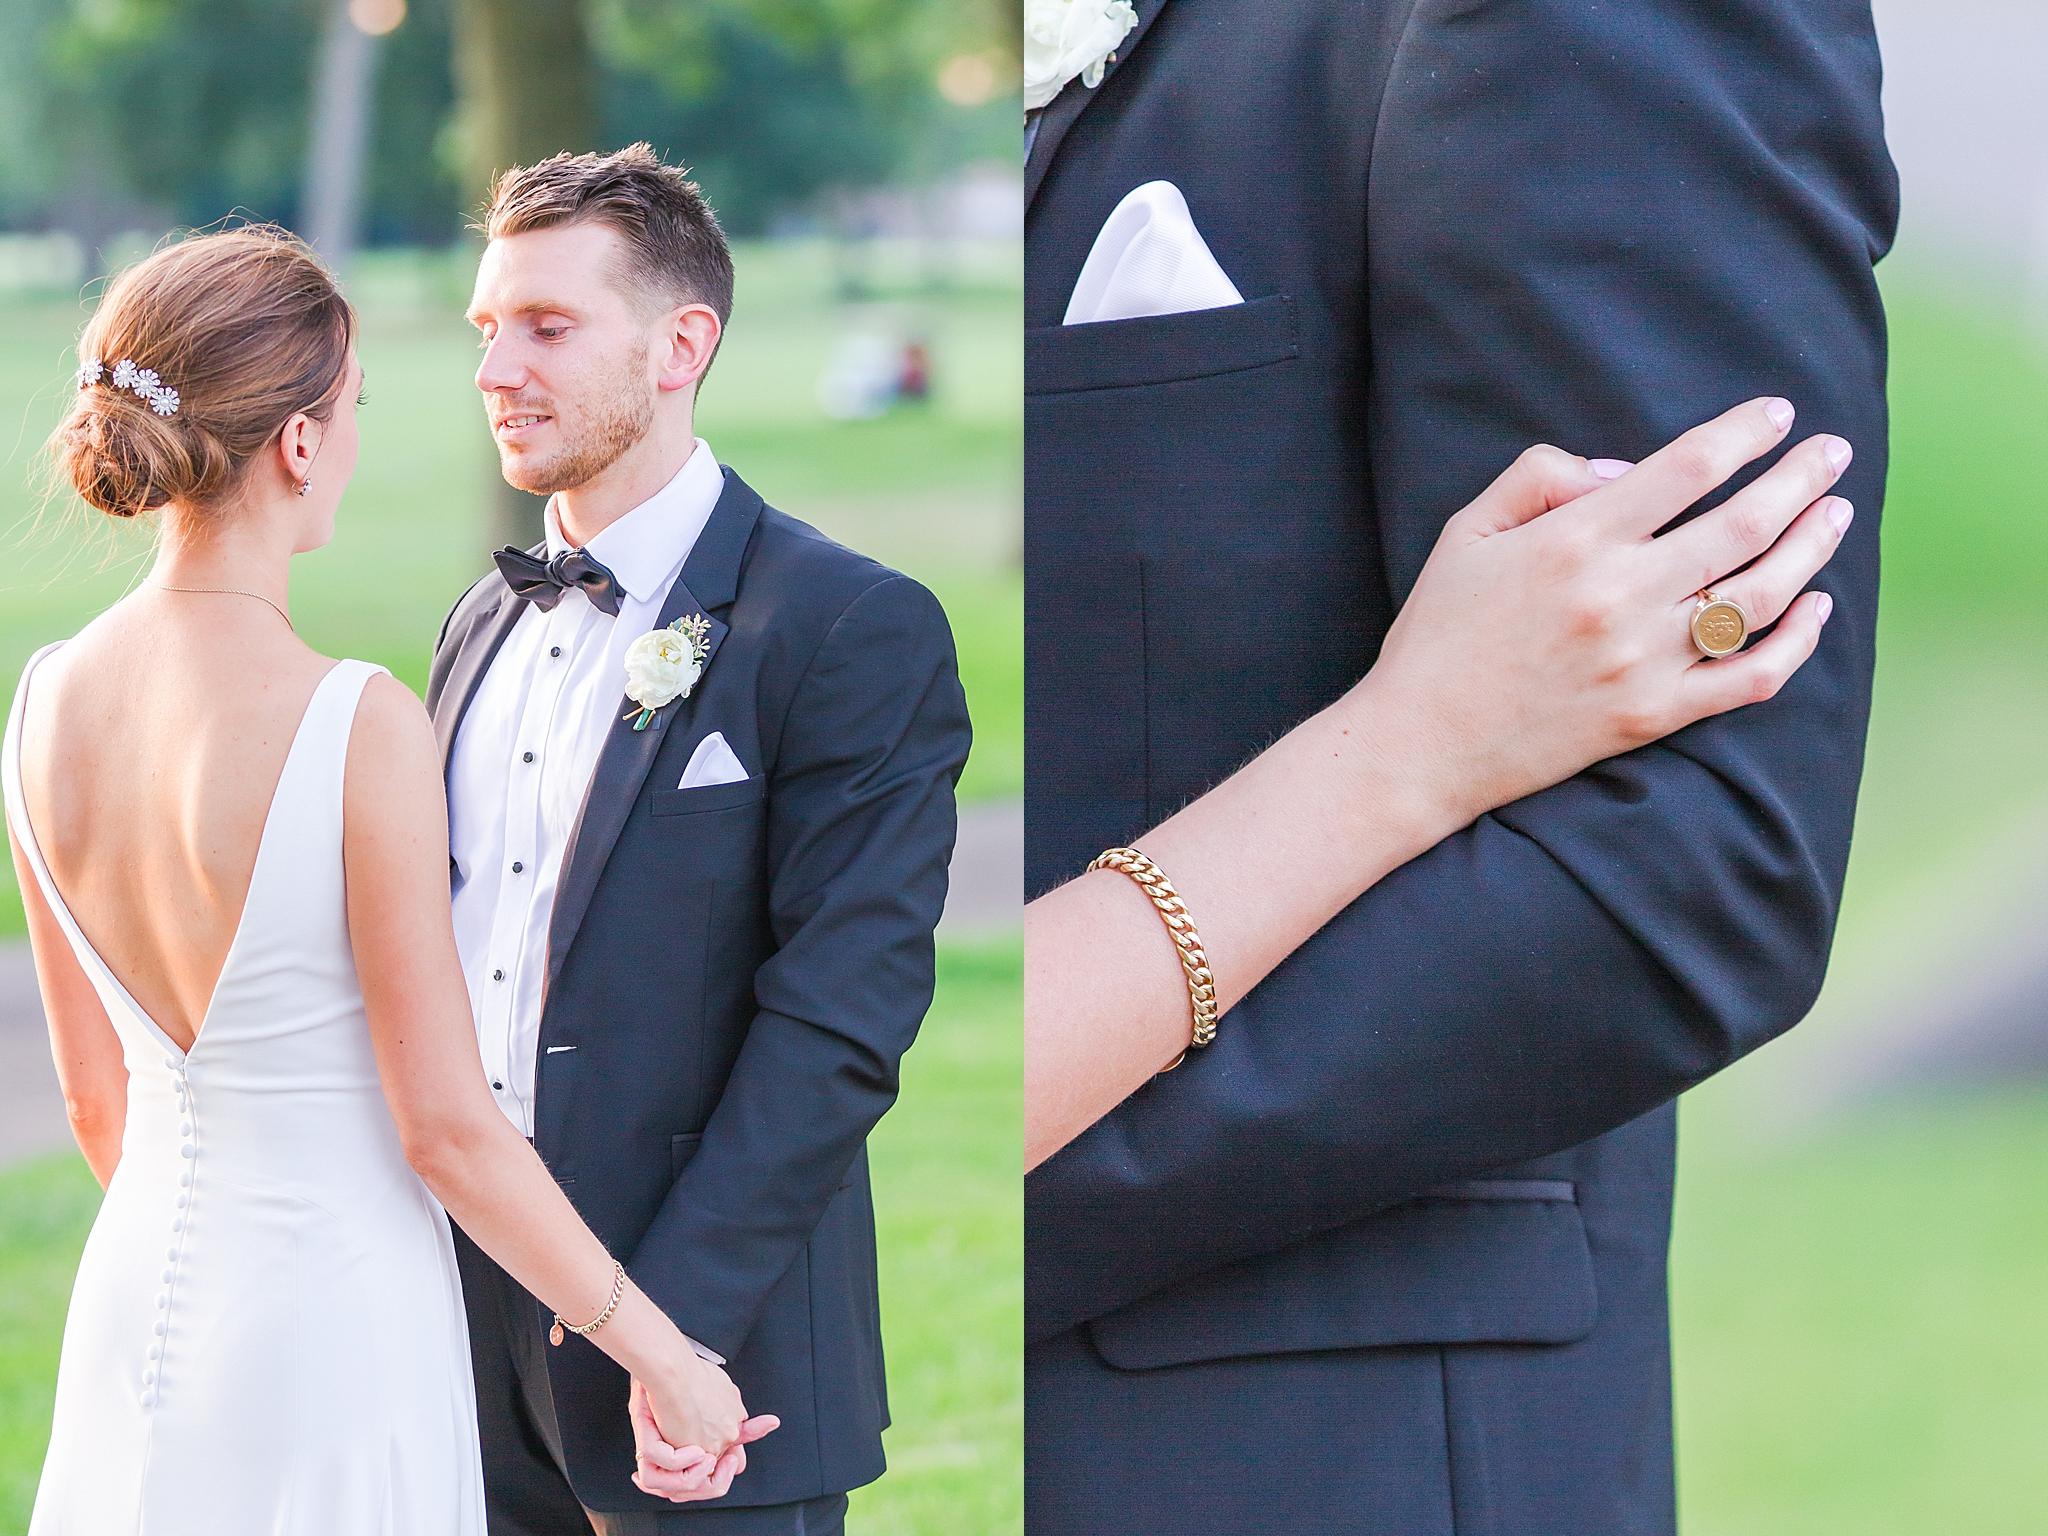 detroit-wedding-photographer-grosse-pointe-academy-chapel-detroit-golf-club-wedding-carly-matt-by-courtney-carolyn-photography_0118.jpg